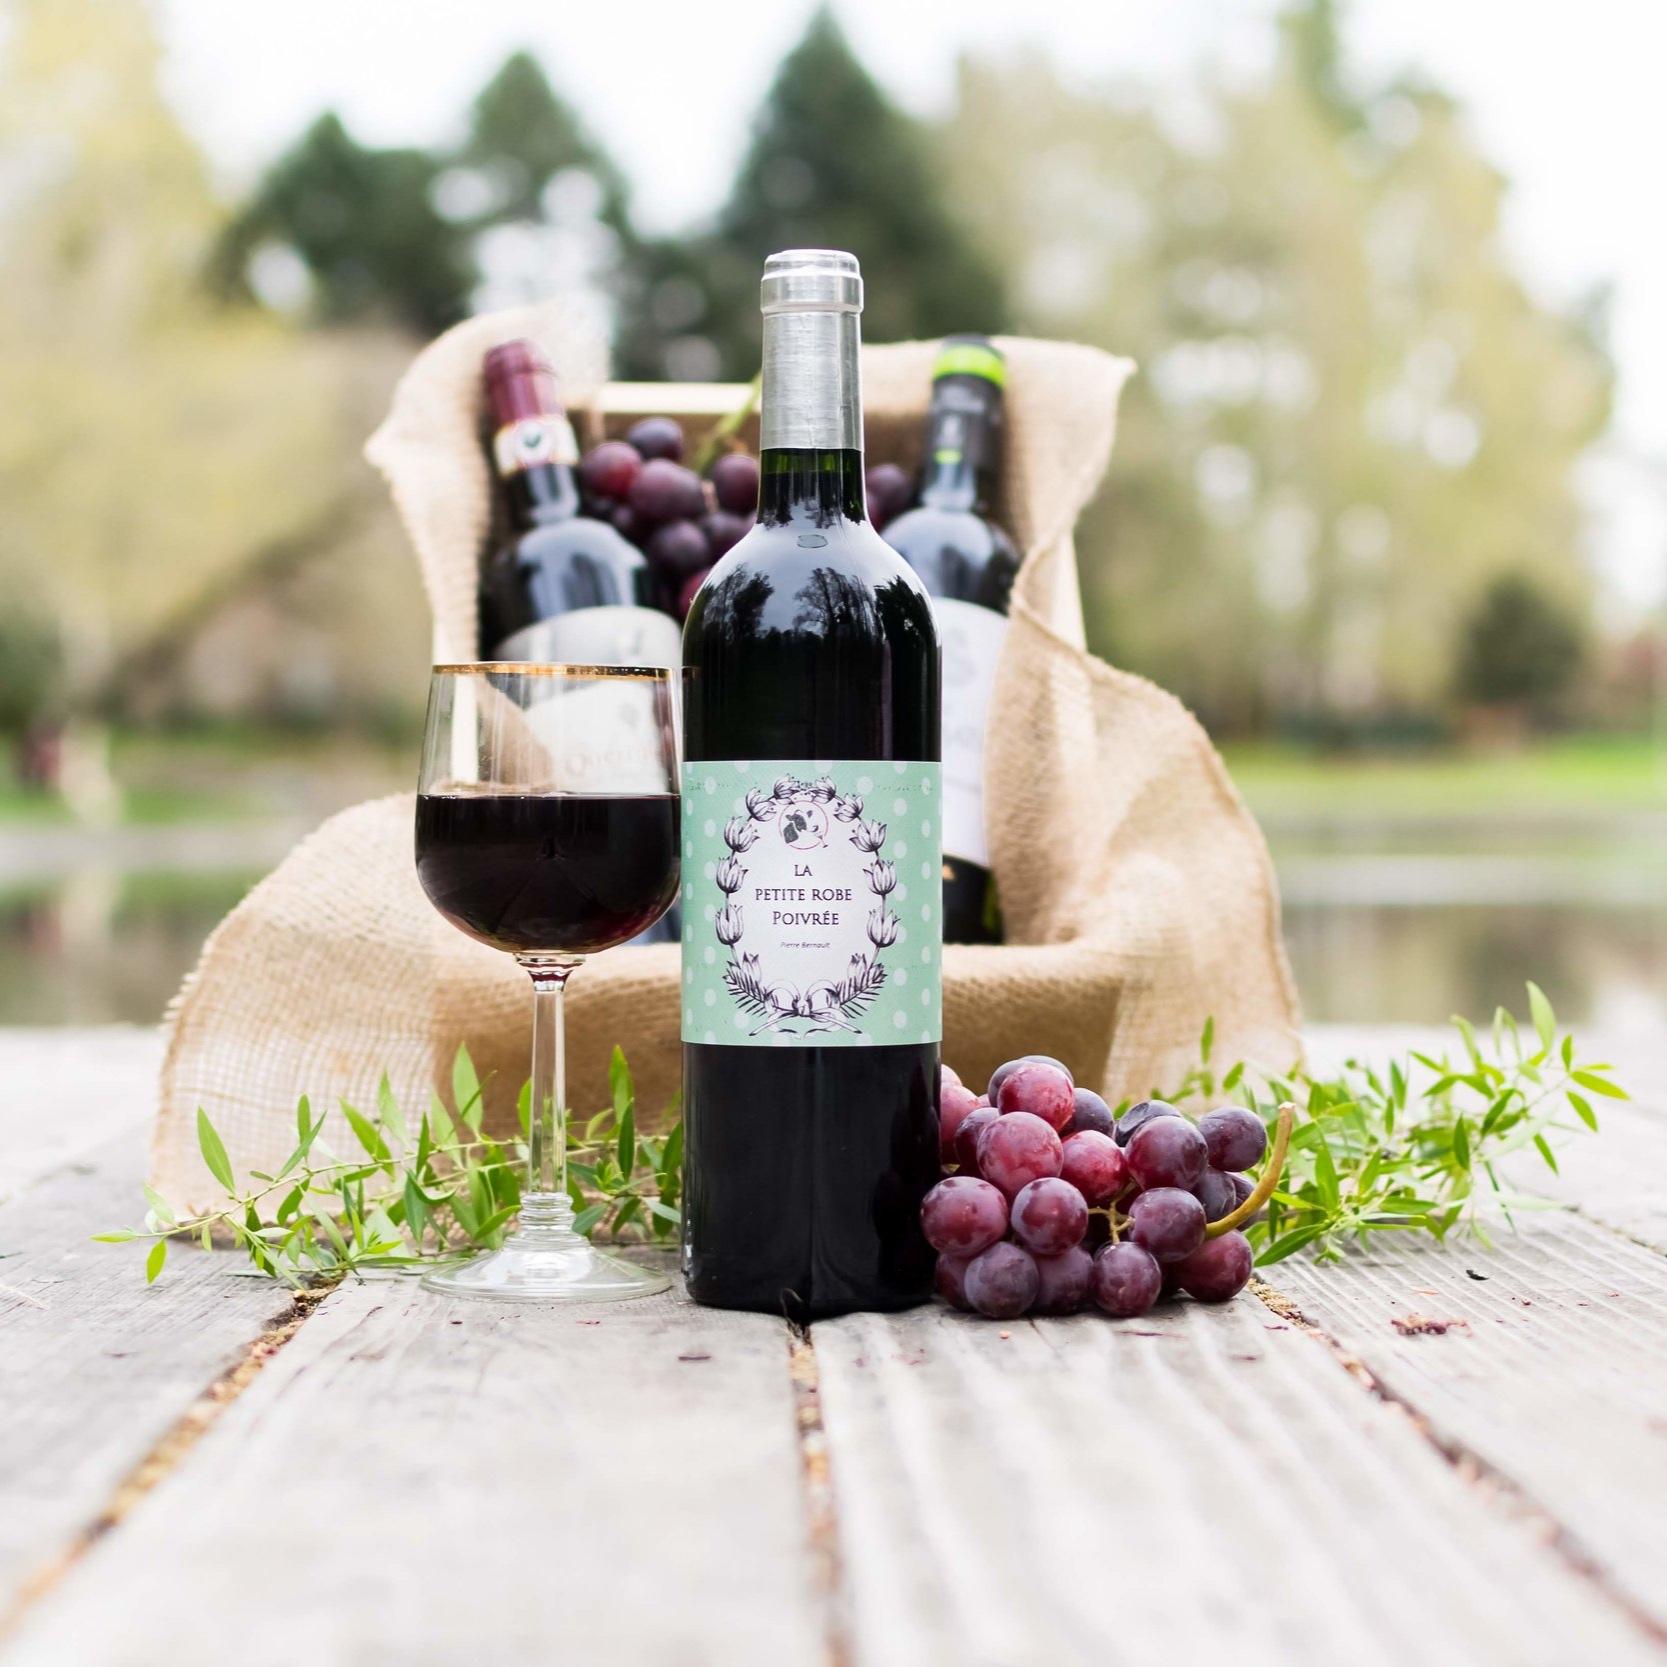 Vegan+Wines-+La+Petite+Robe+Poivree+Feature-+centered-2.jpg